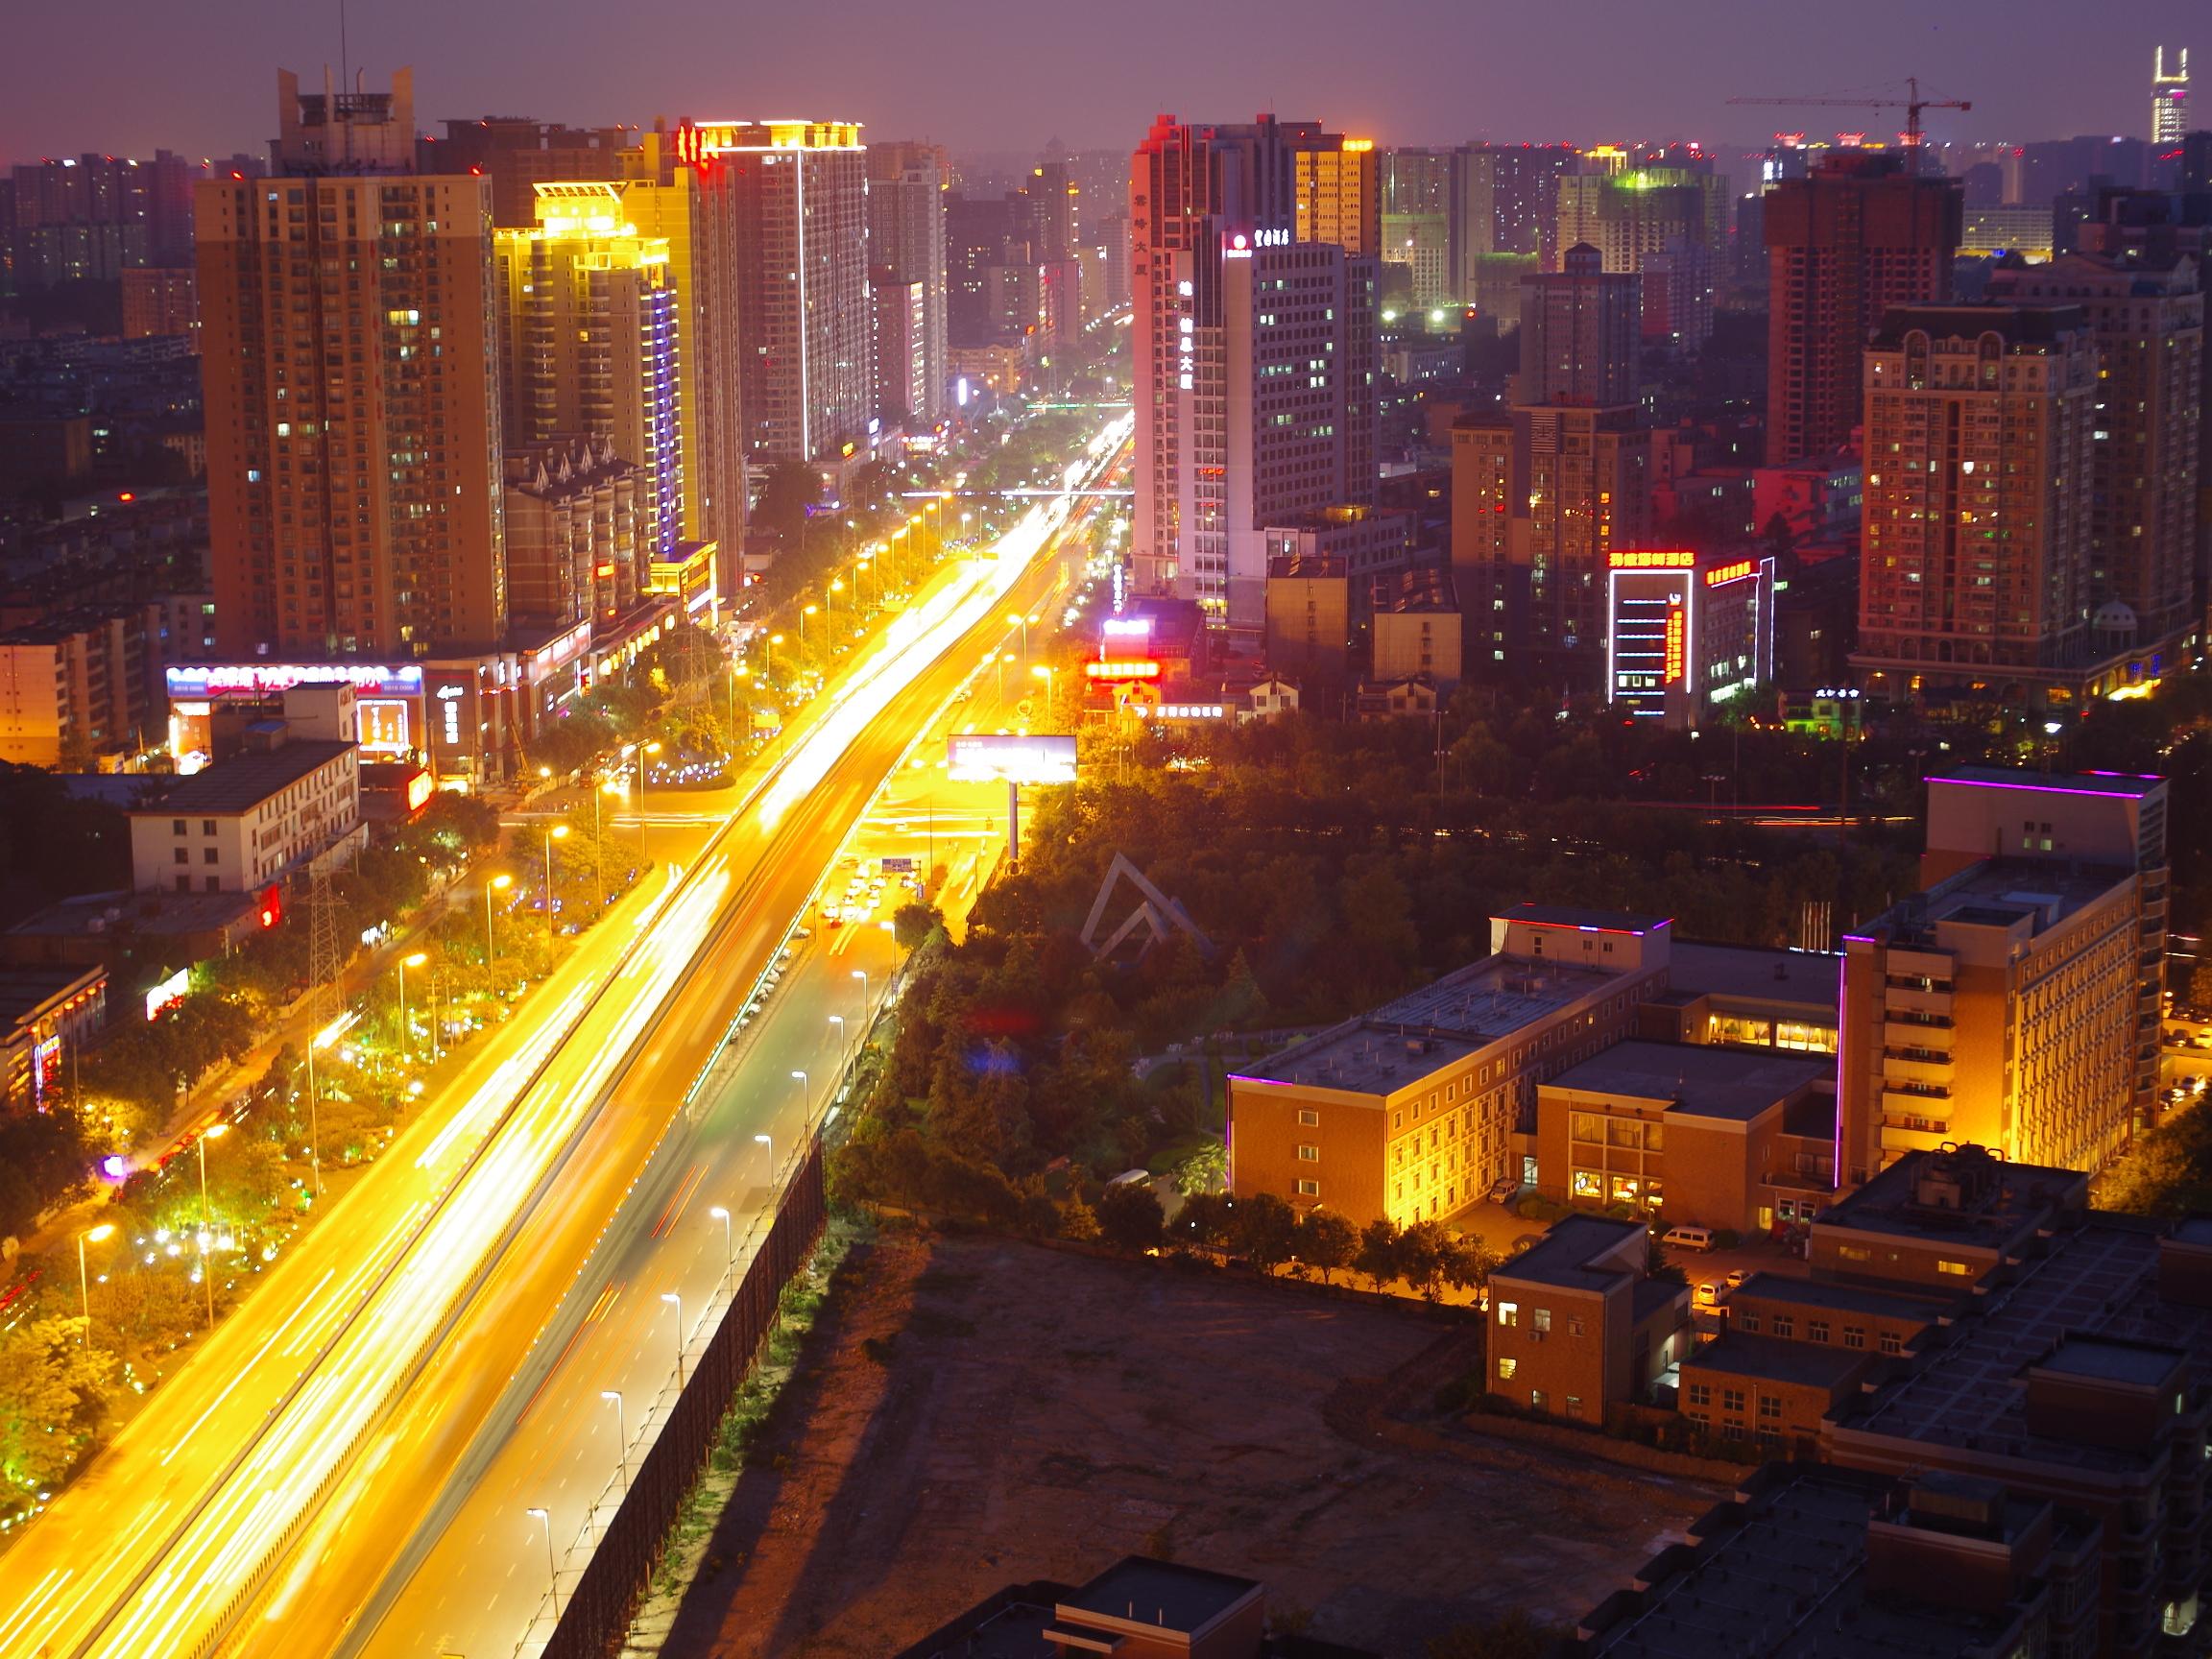 File:Xi'an erhuan southeast.JPG